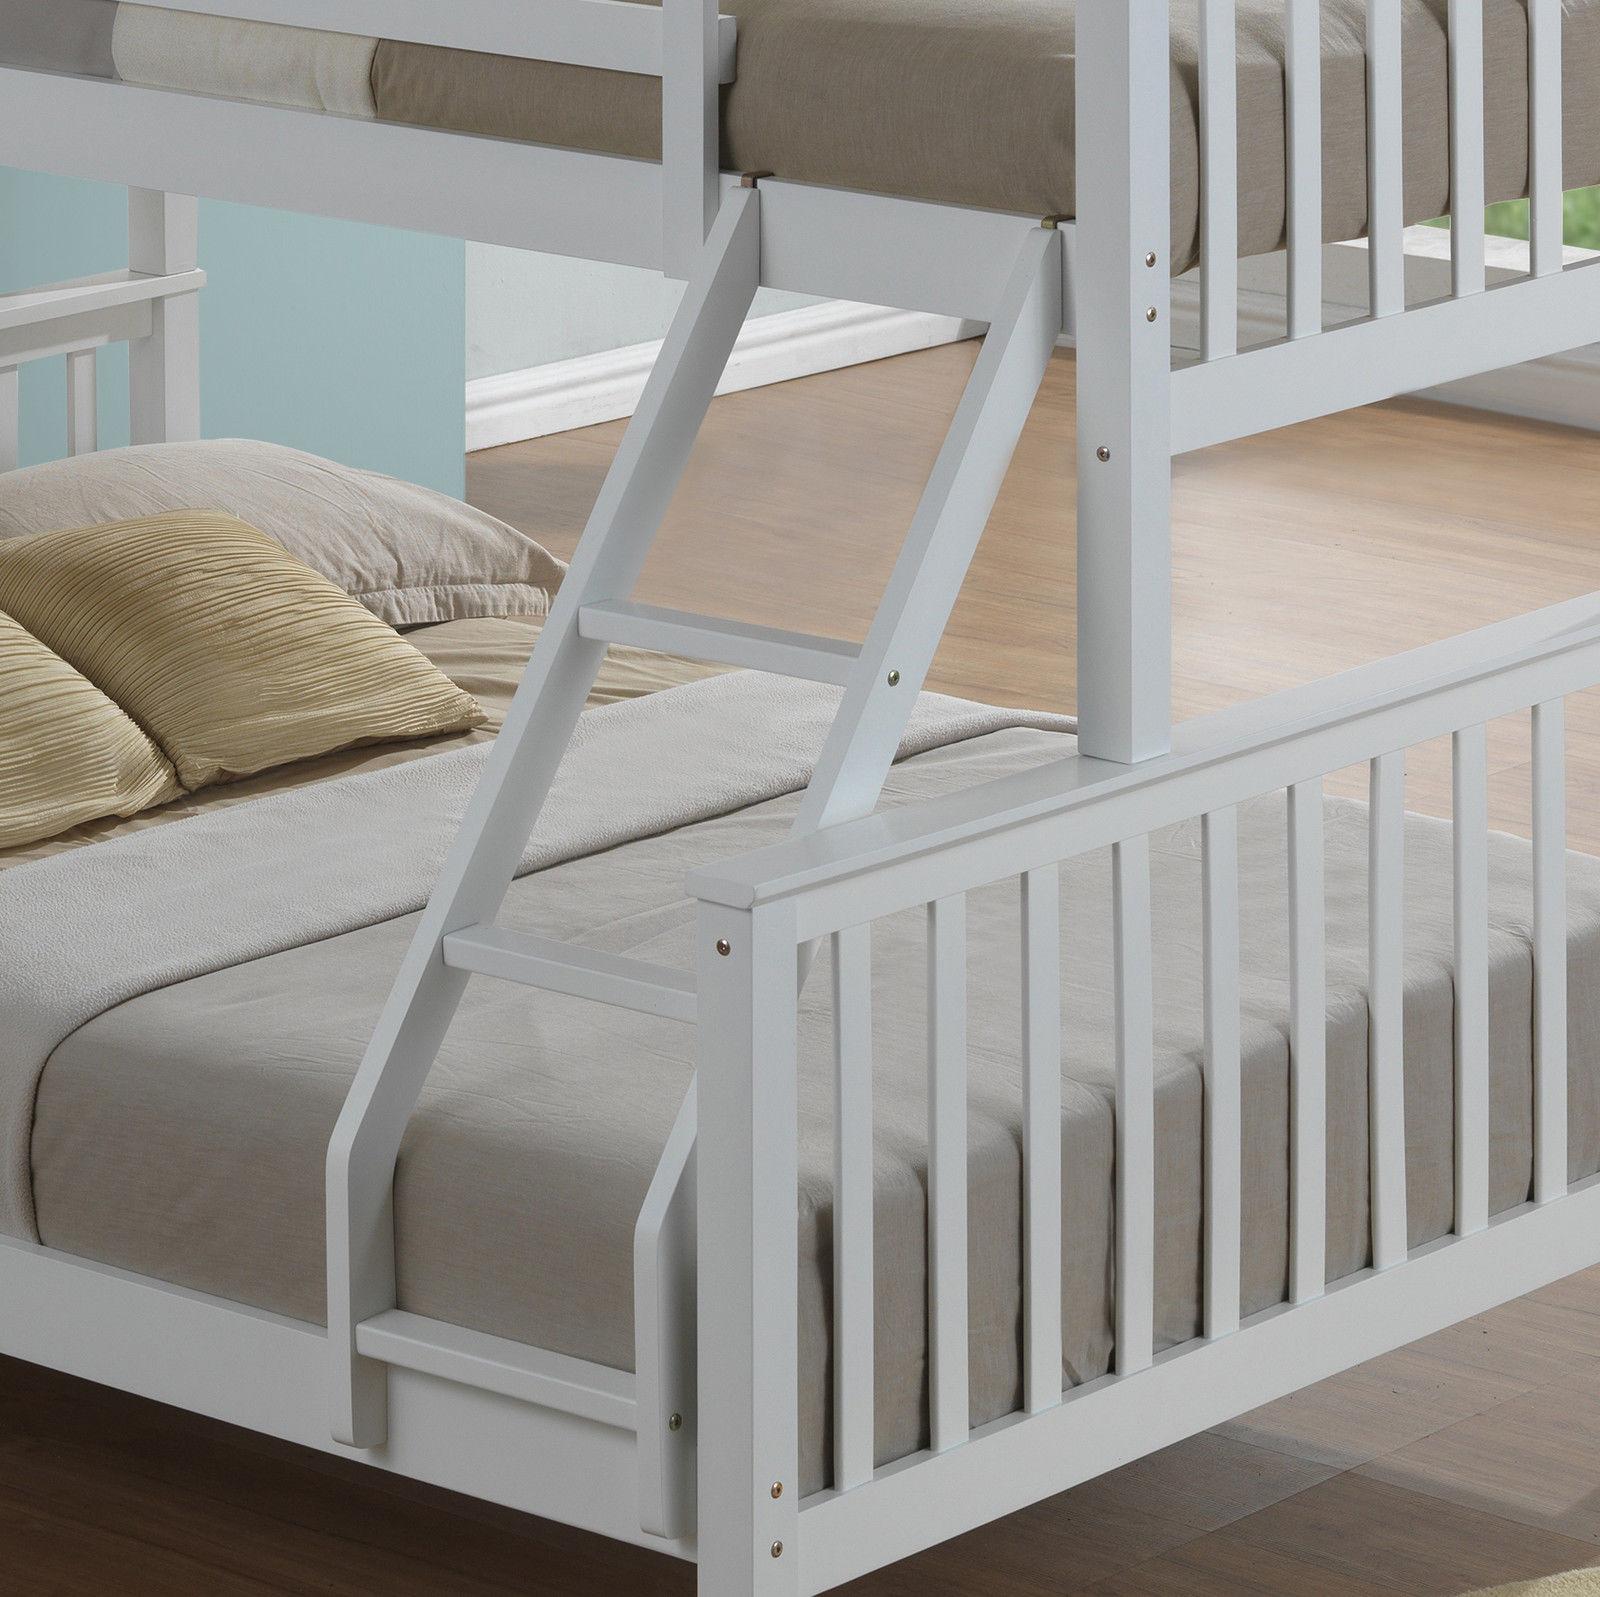 Modern 3 Sleeper White Childrens Bunk Bed  Inc Drawers